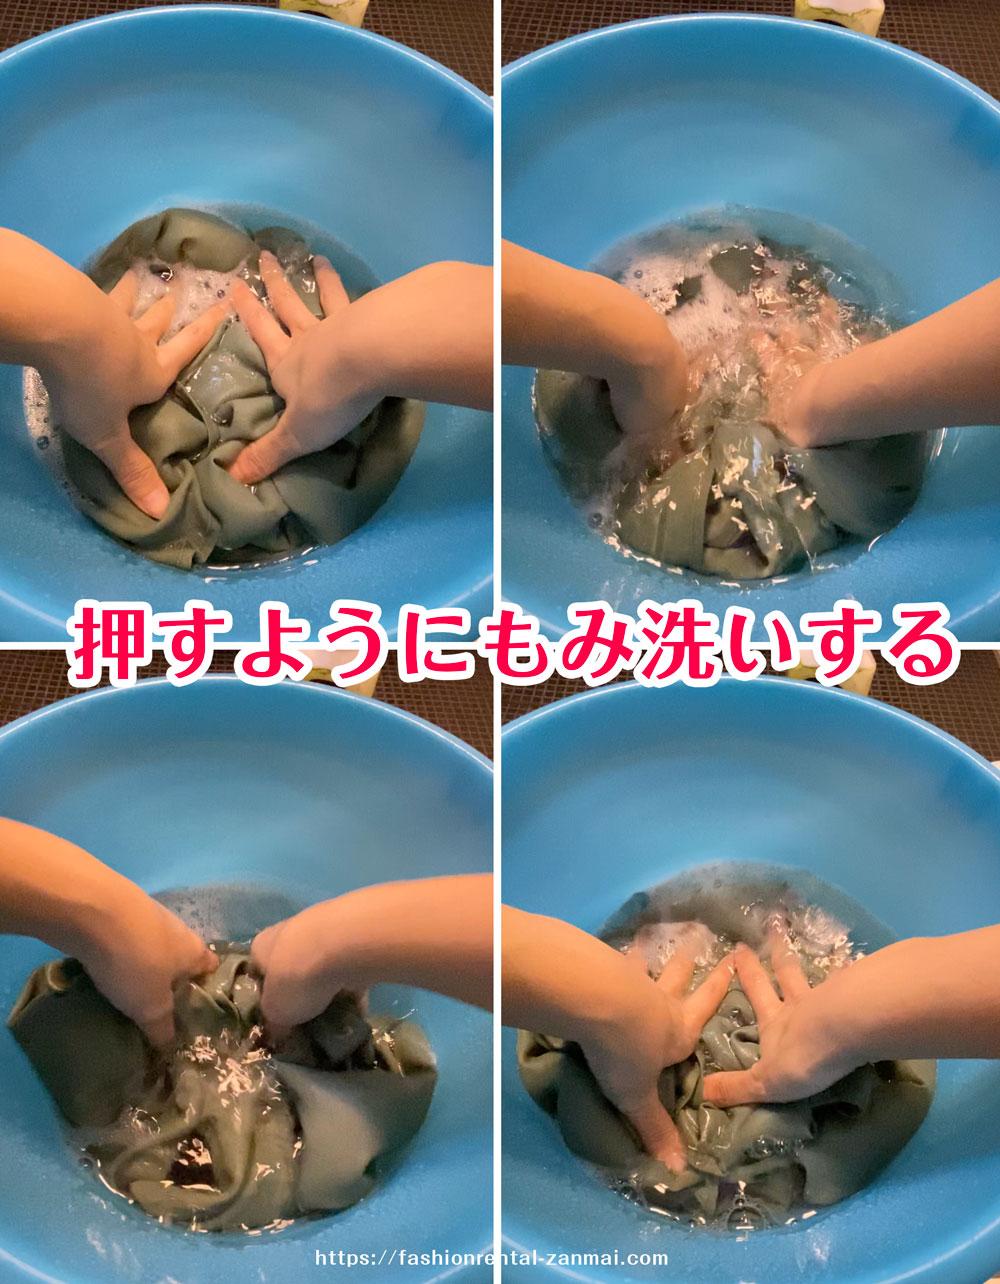 Rcawaiiの洋服を洗濯する(手洗いの場合・押すようにもみ洗いする)